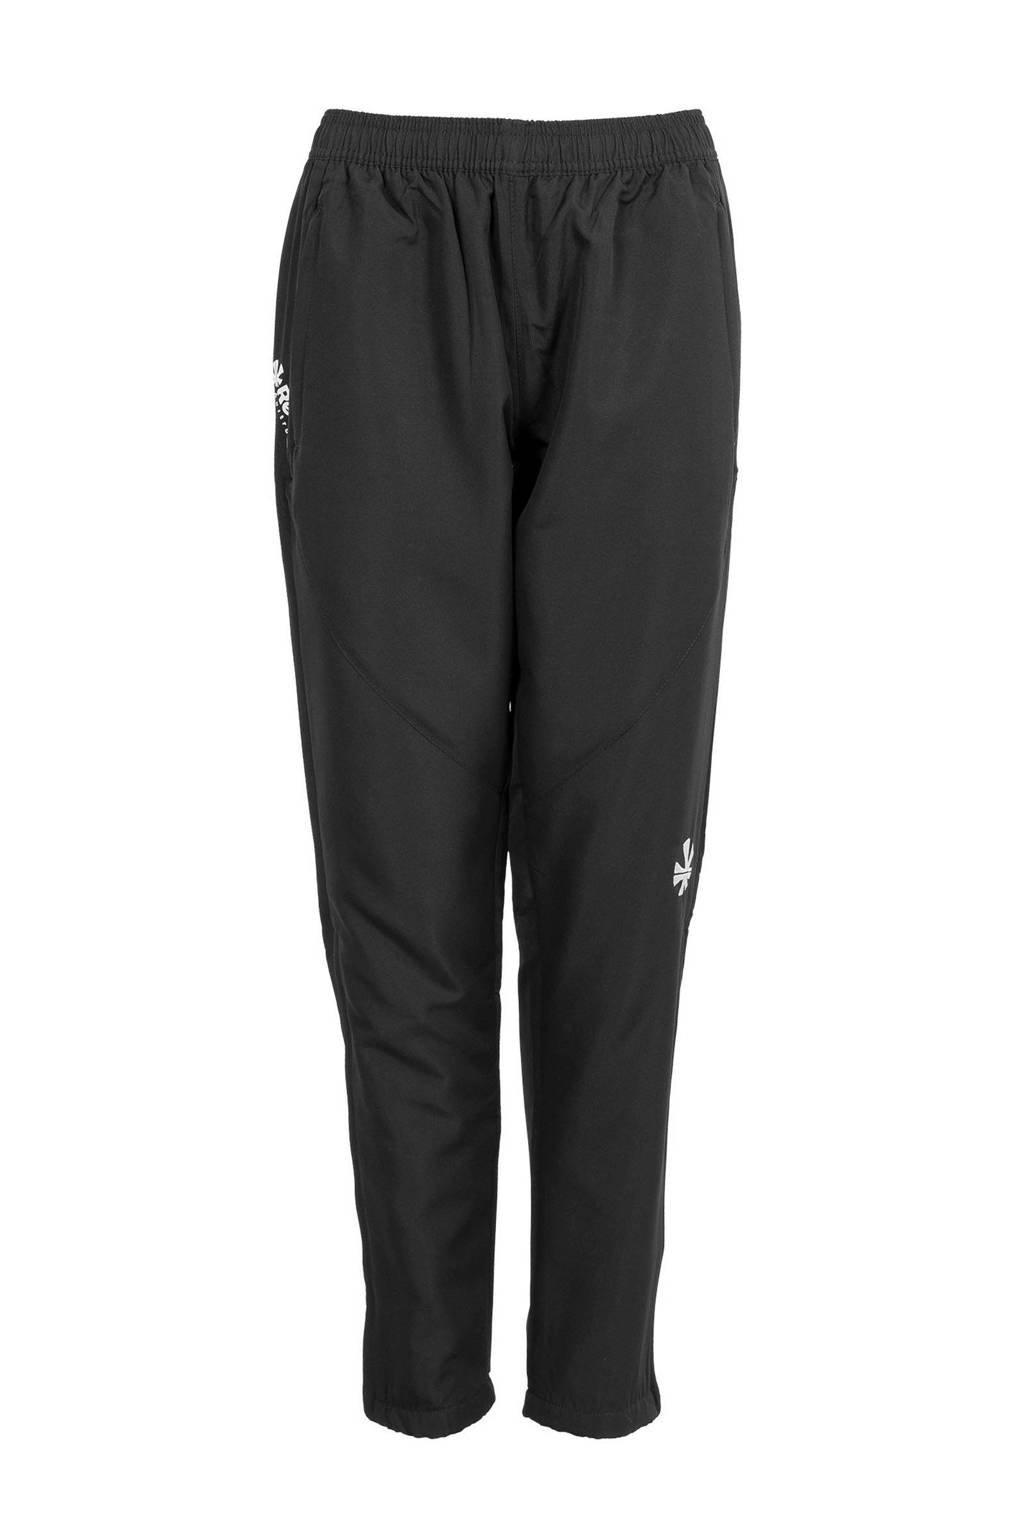 Reece Australia sportbroek Varsity zwart, Zwart